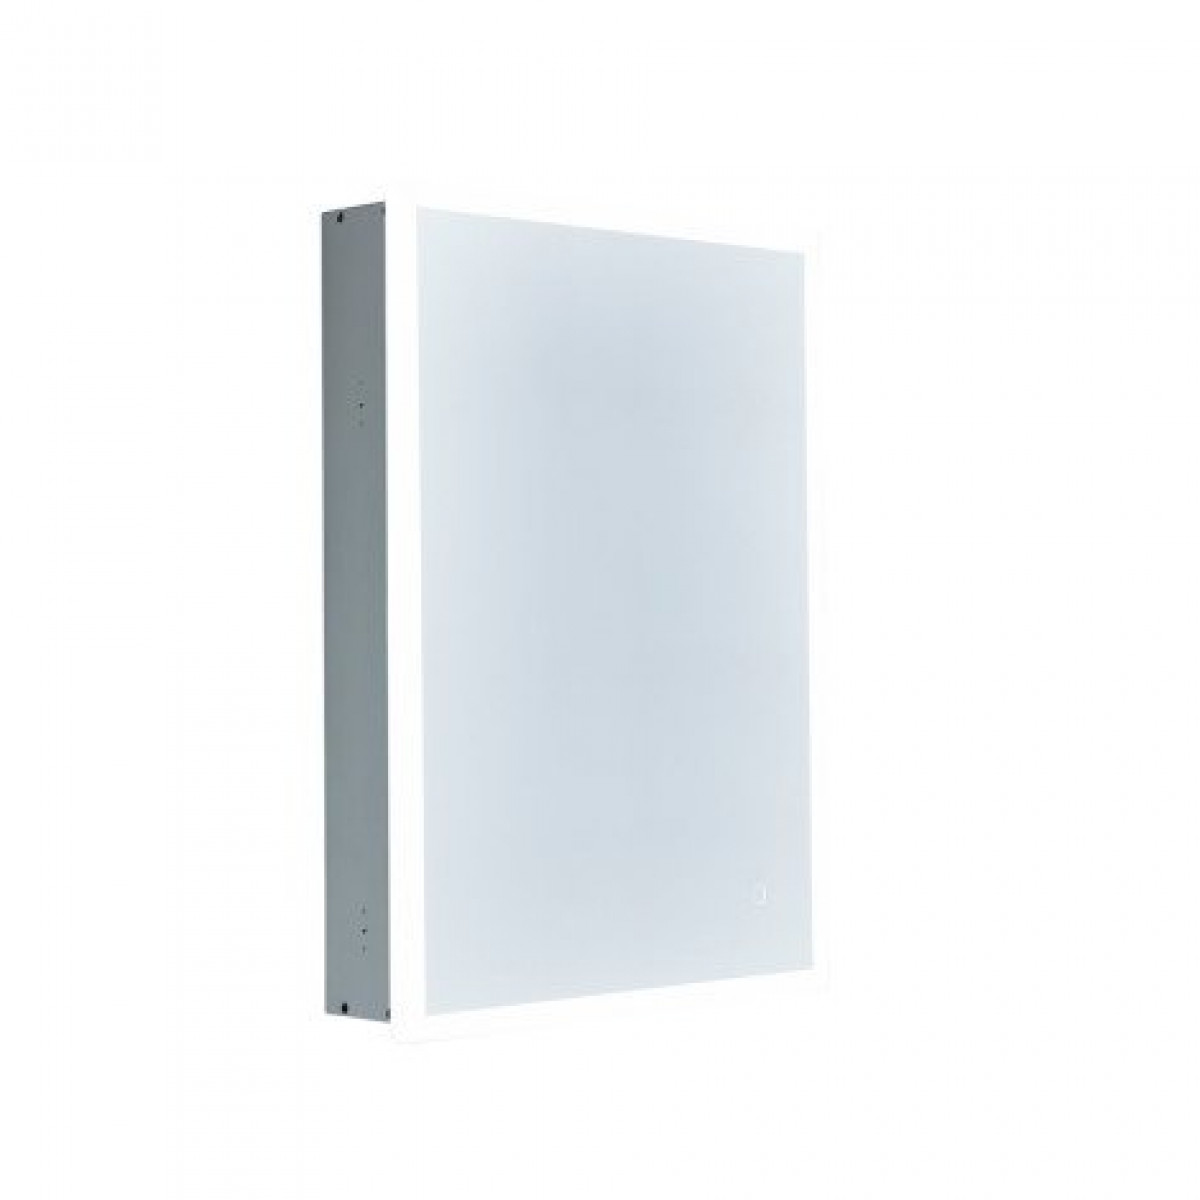 buy online ccf19 03298 Roper Rhodes Purpose Single Door 500mm LED Bathroom Cabinet